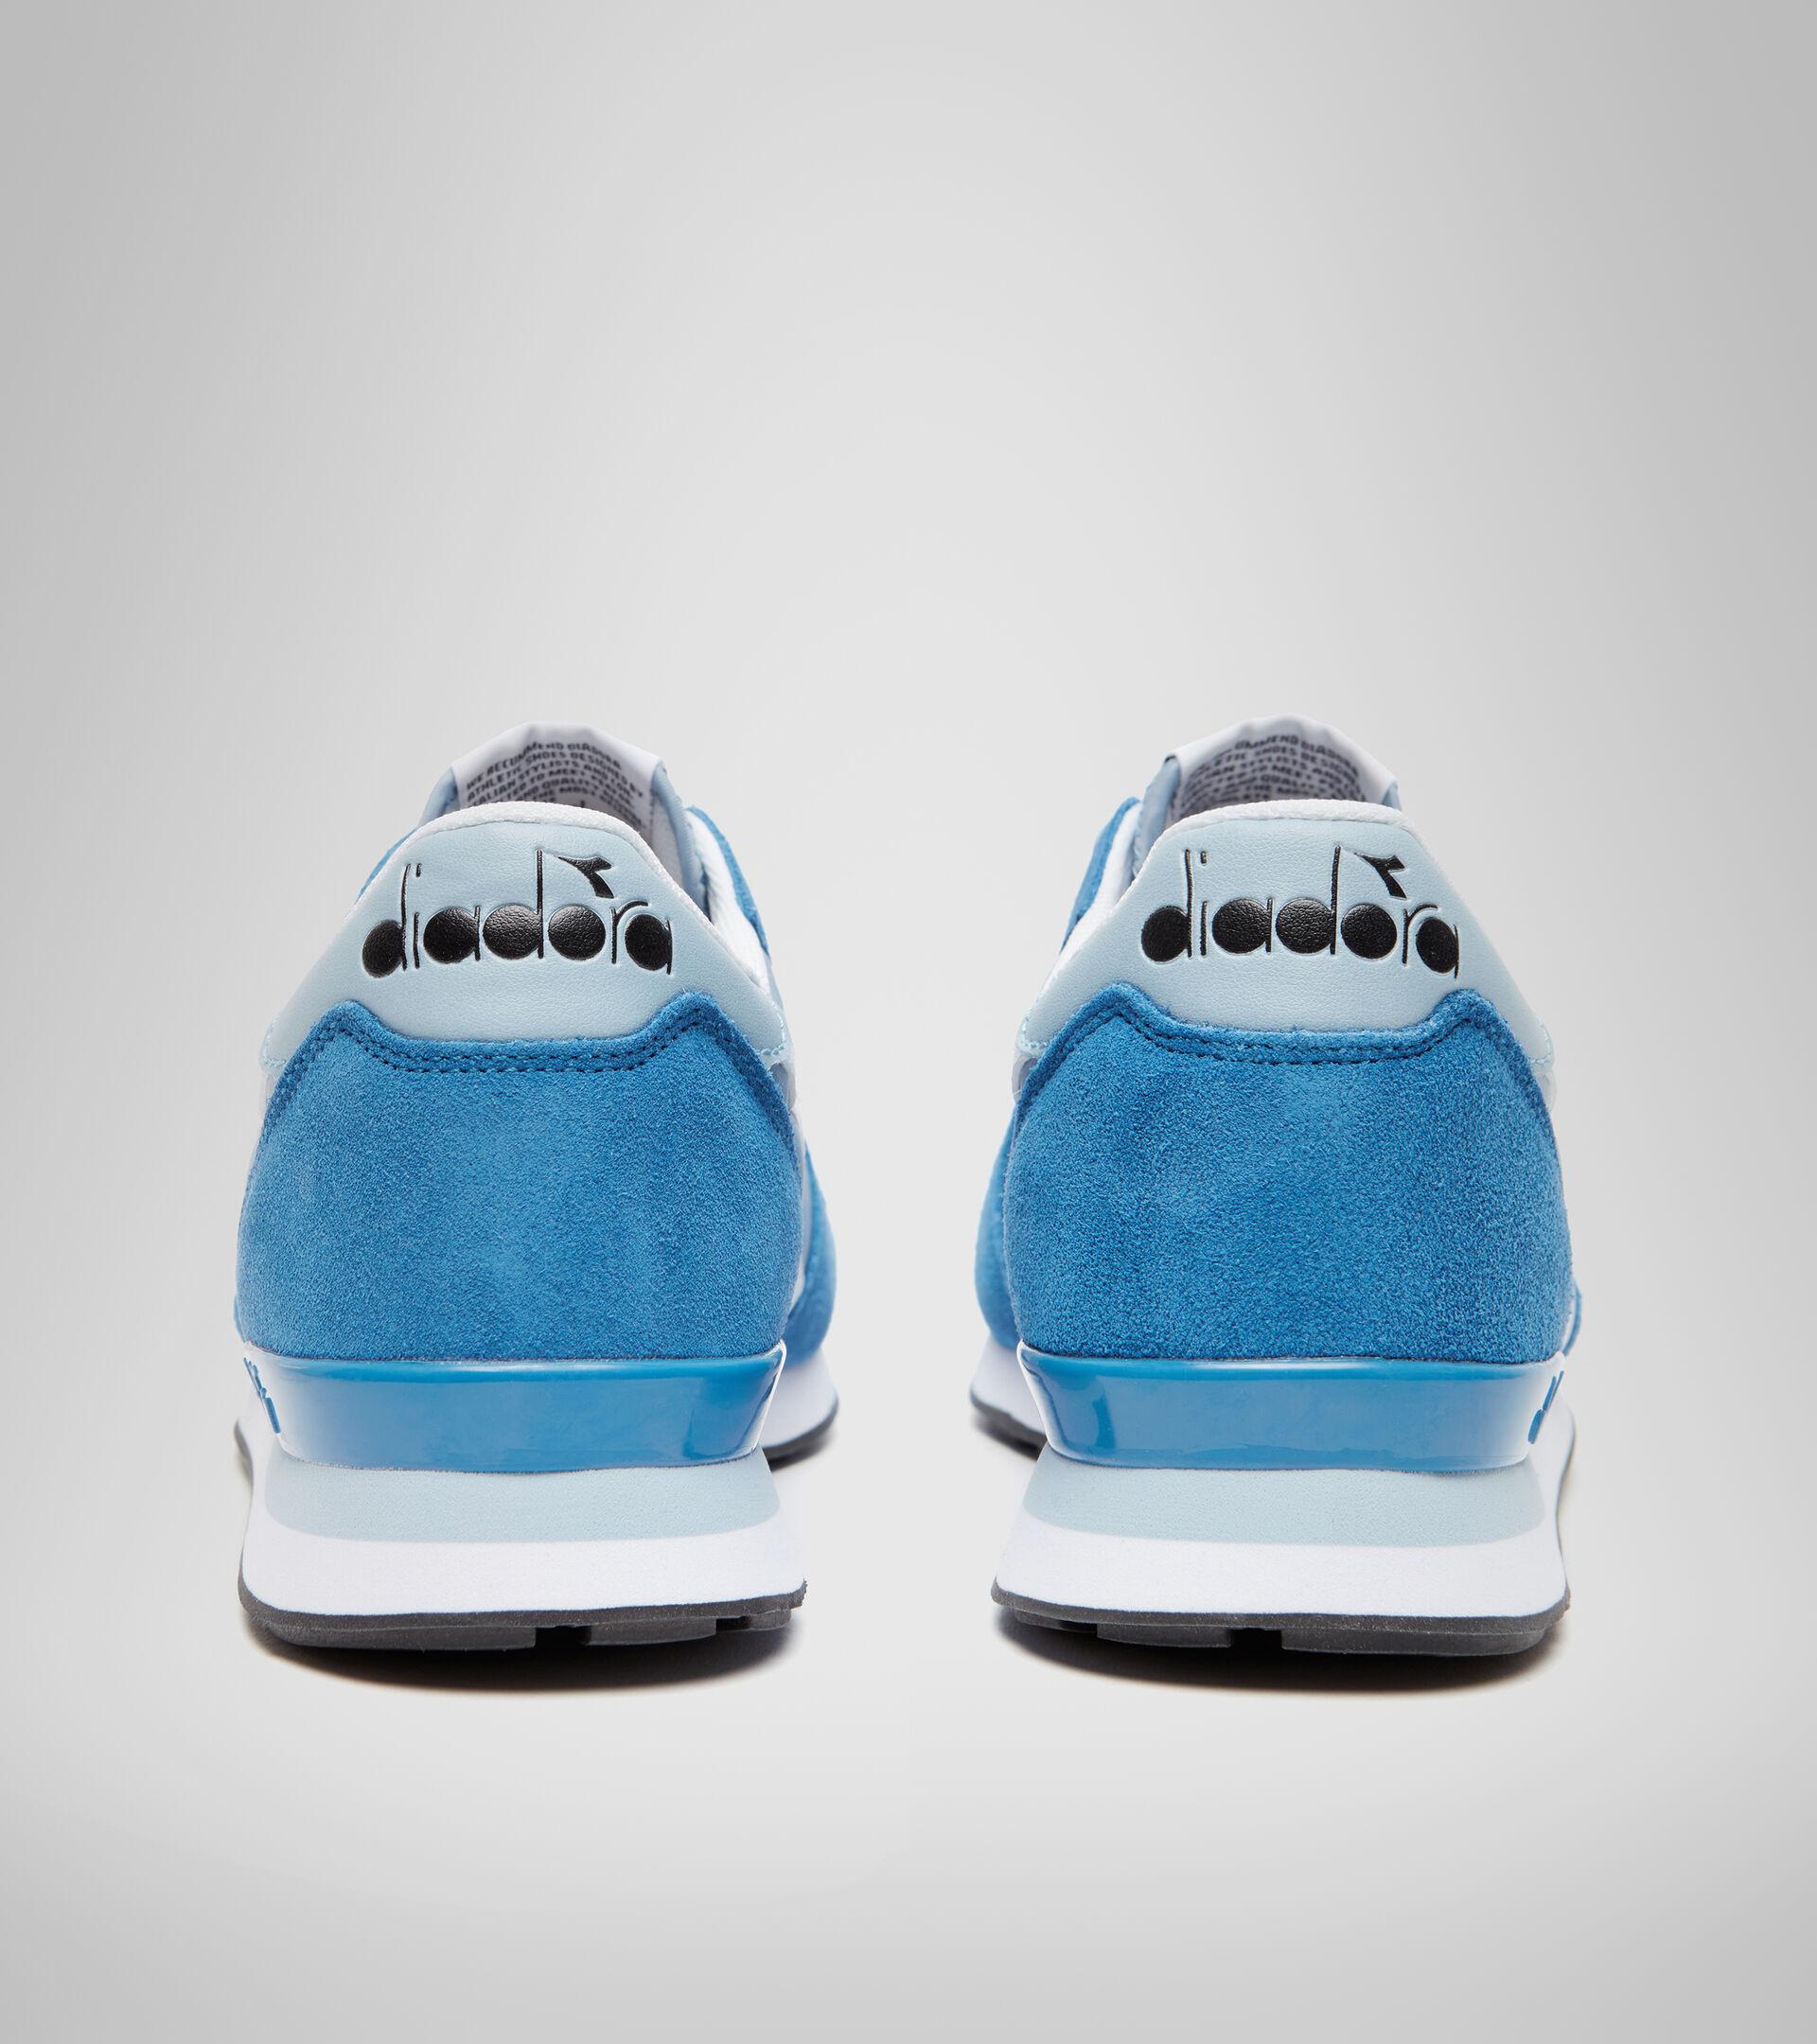 Footwear Sportswear UNISEX CAMARO AZUL NIEBLA/AZUL VALLARTA Diadora